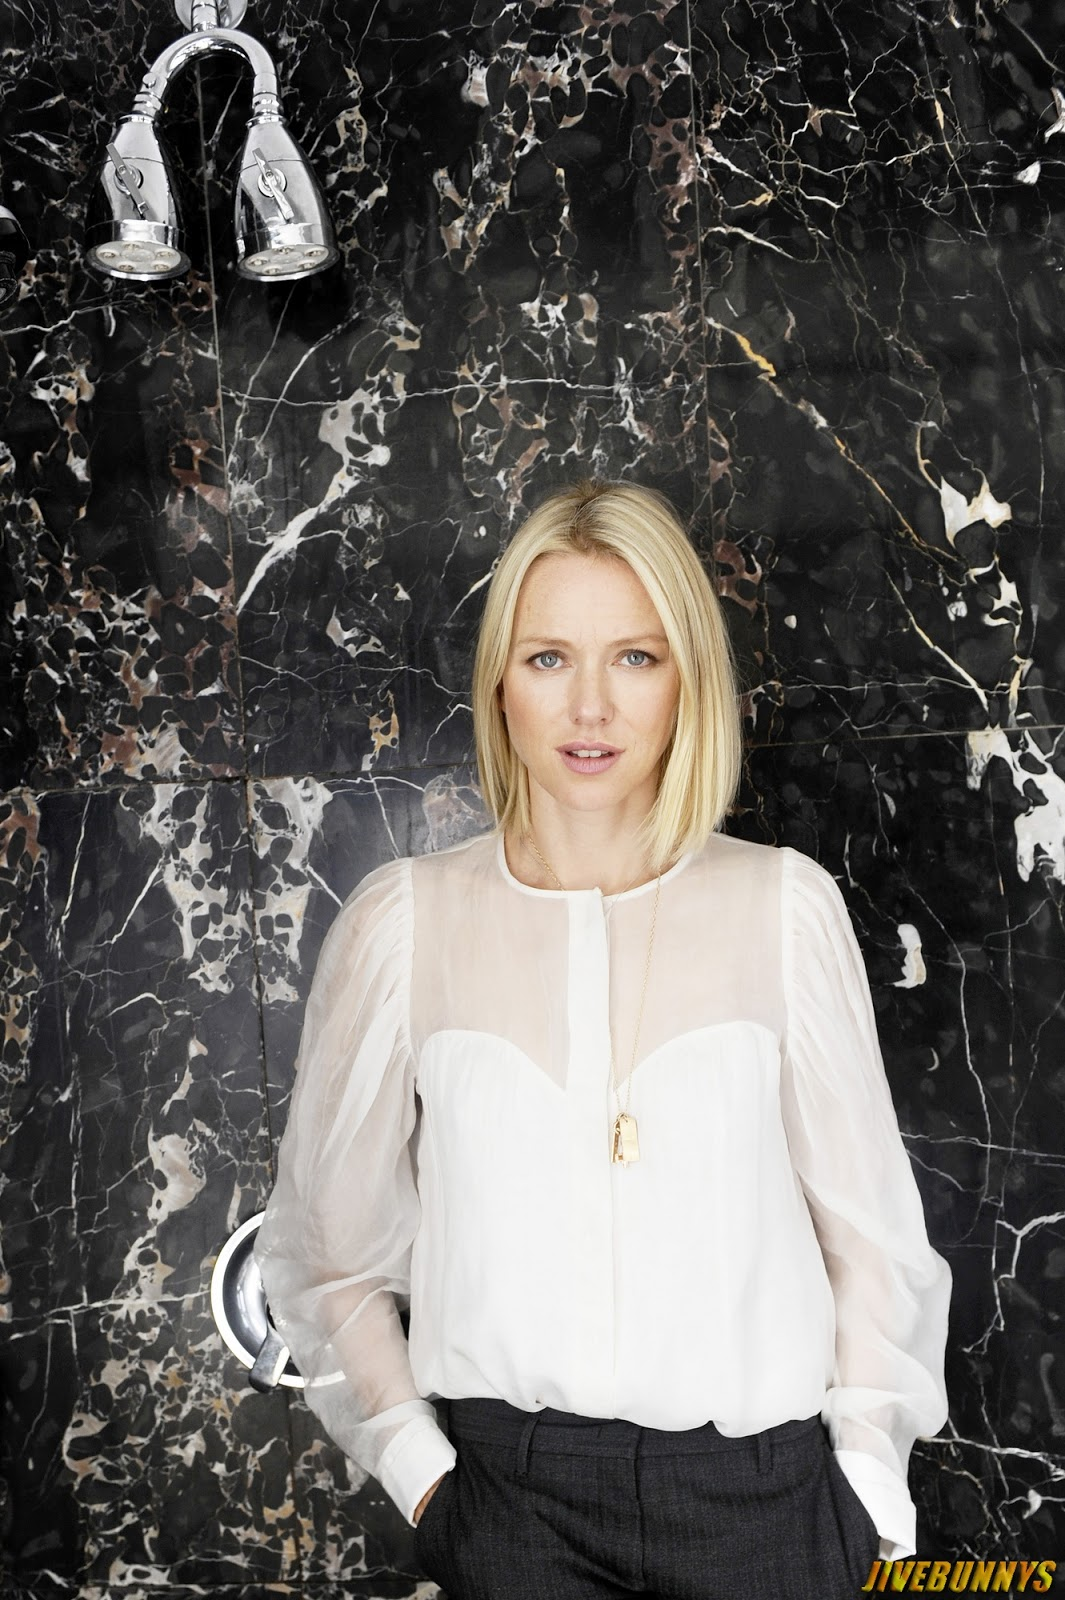 Jivebunnys Female Celebrity Picture Gallery: Naomi Watts ... Naomi Watts Movies List